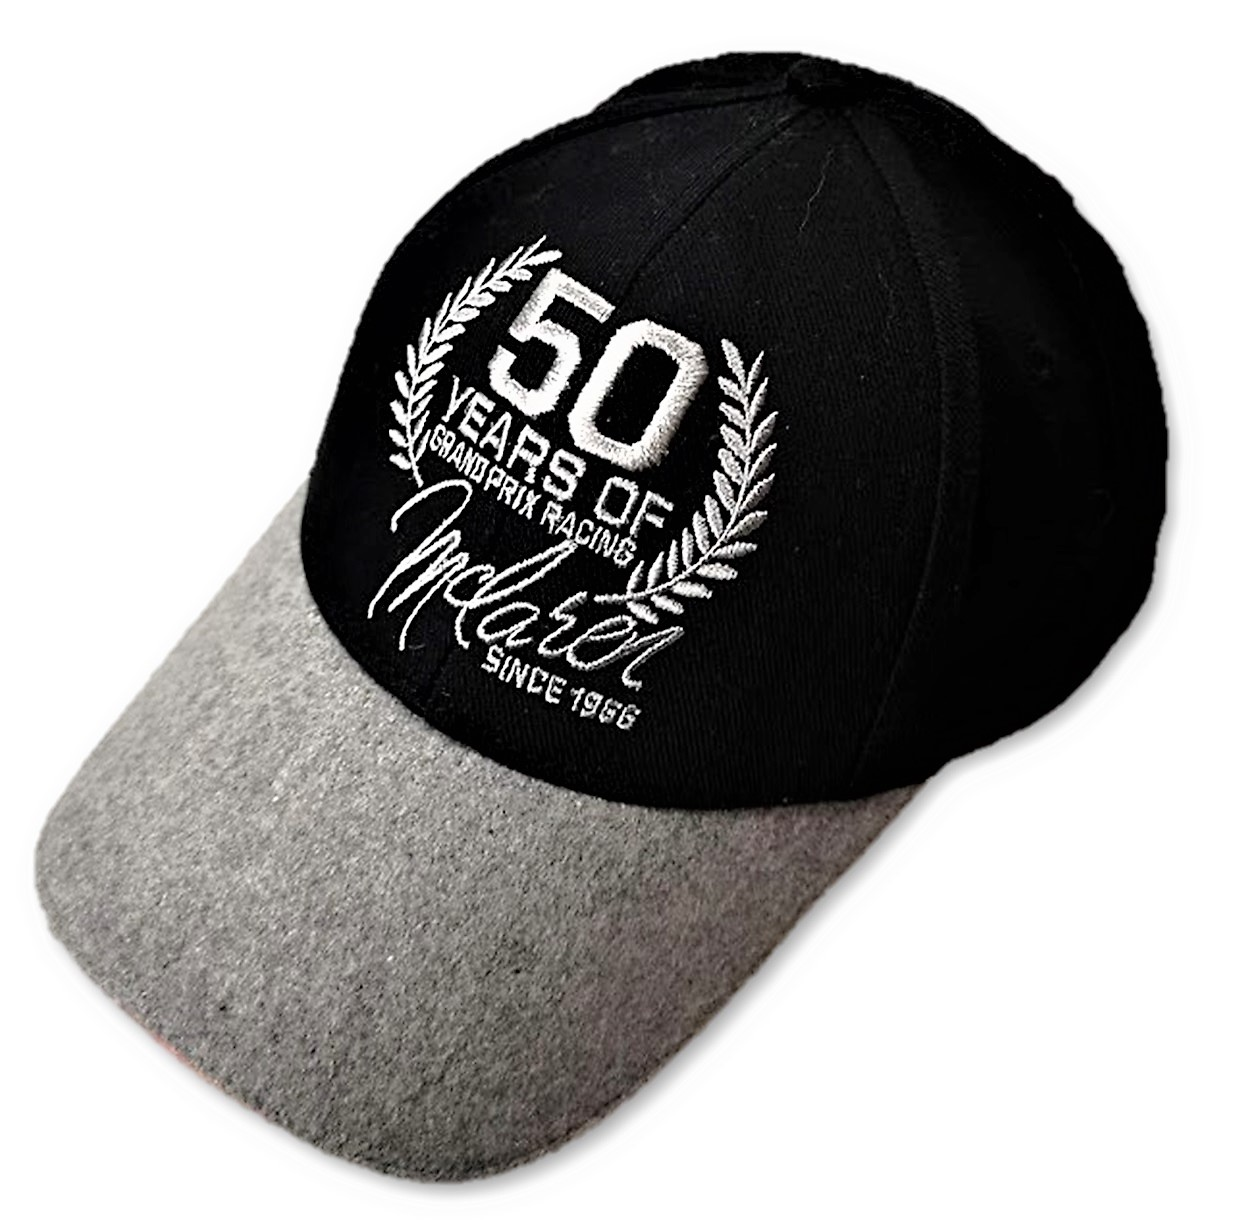 Premium Official Merchandise Black BELT Team McLaren Formula One 1 F1 NEW